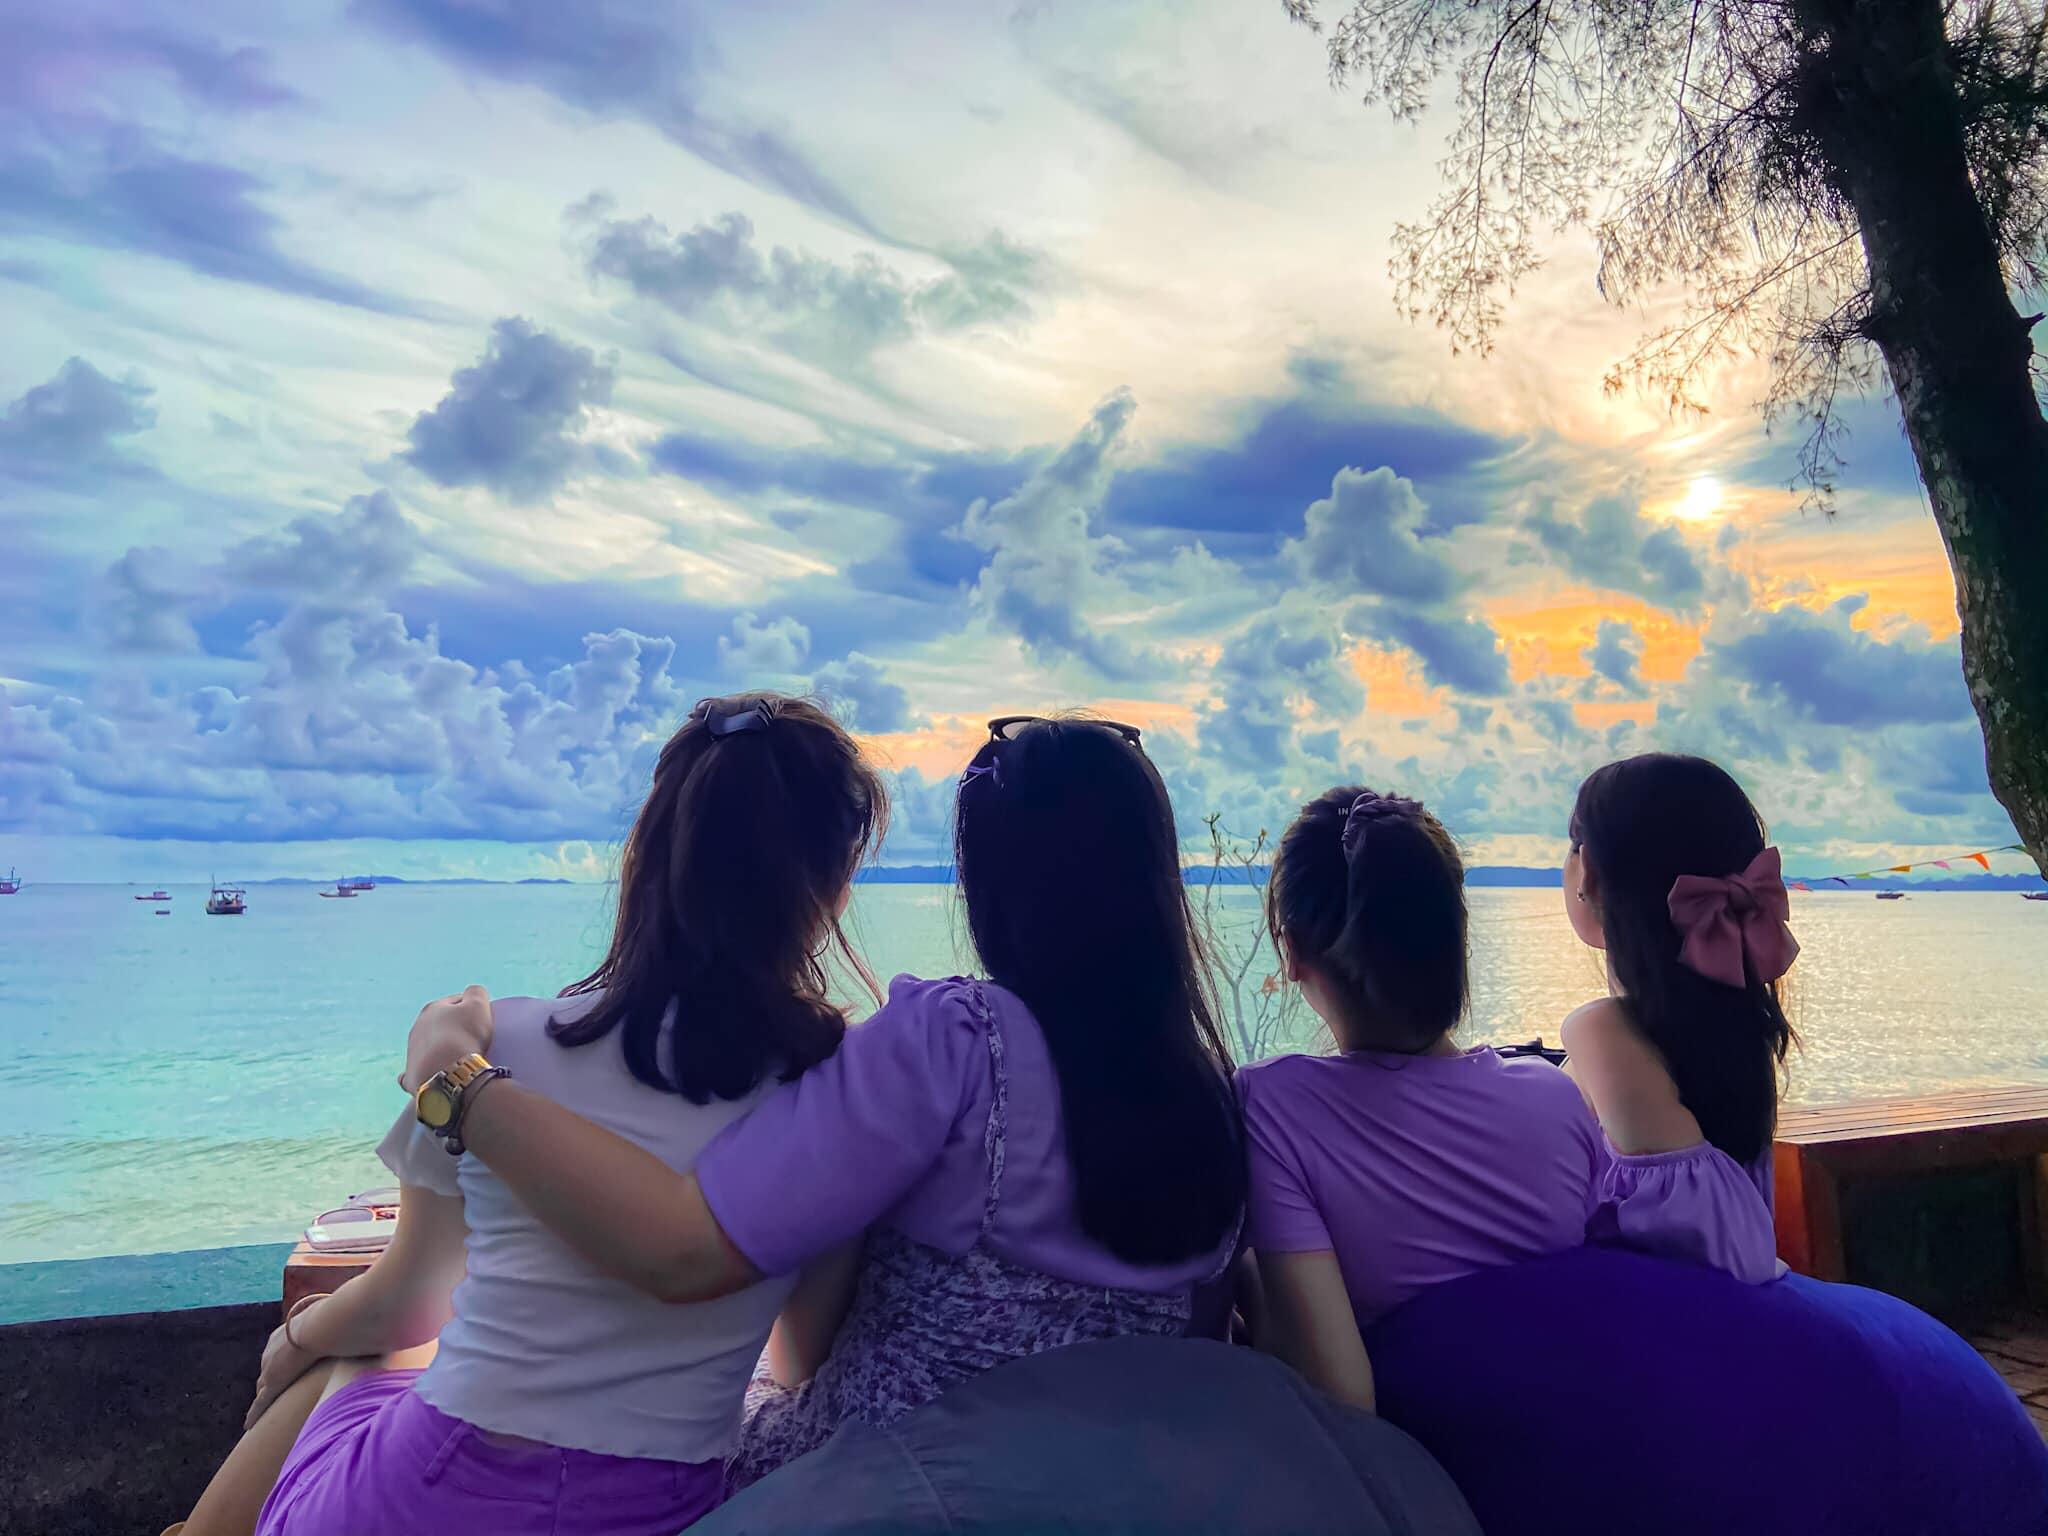 xung-xinh-checkin-nhung-bai-tam-dep-o-co-to-vietmountain-travel1